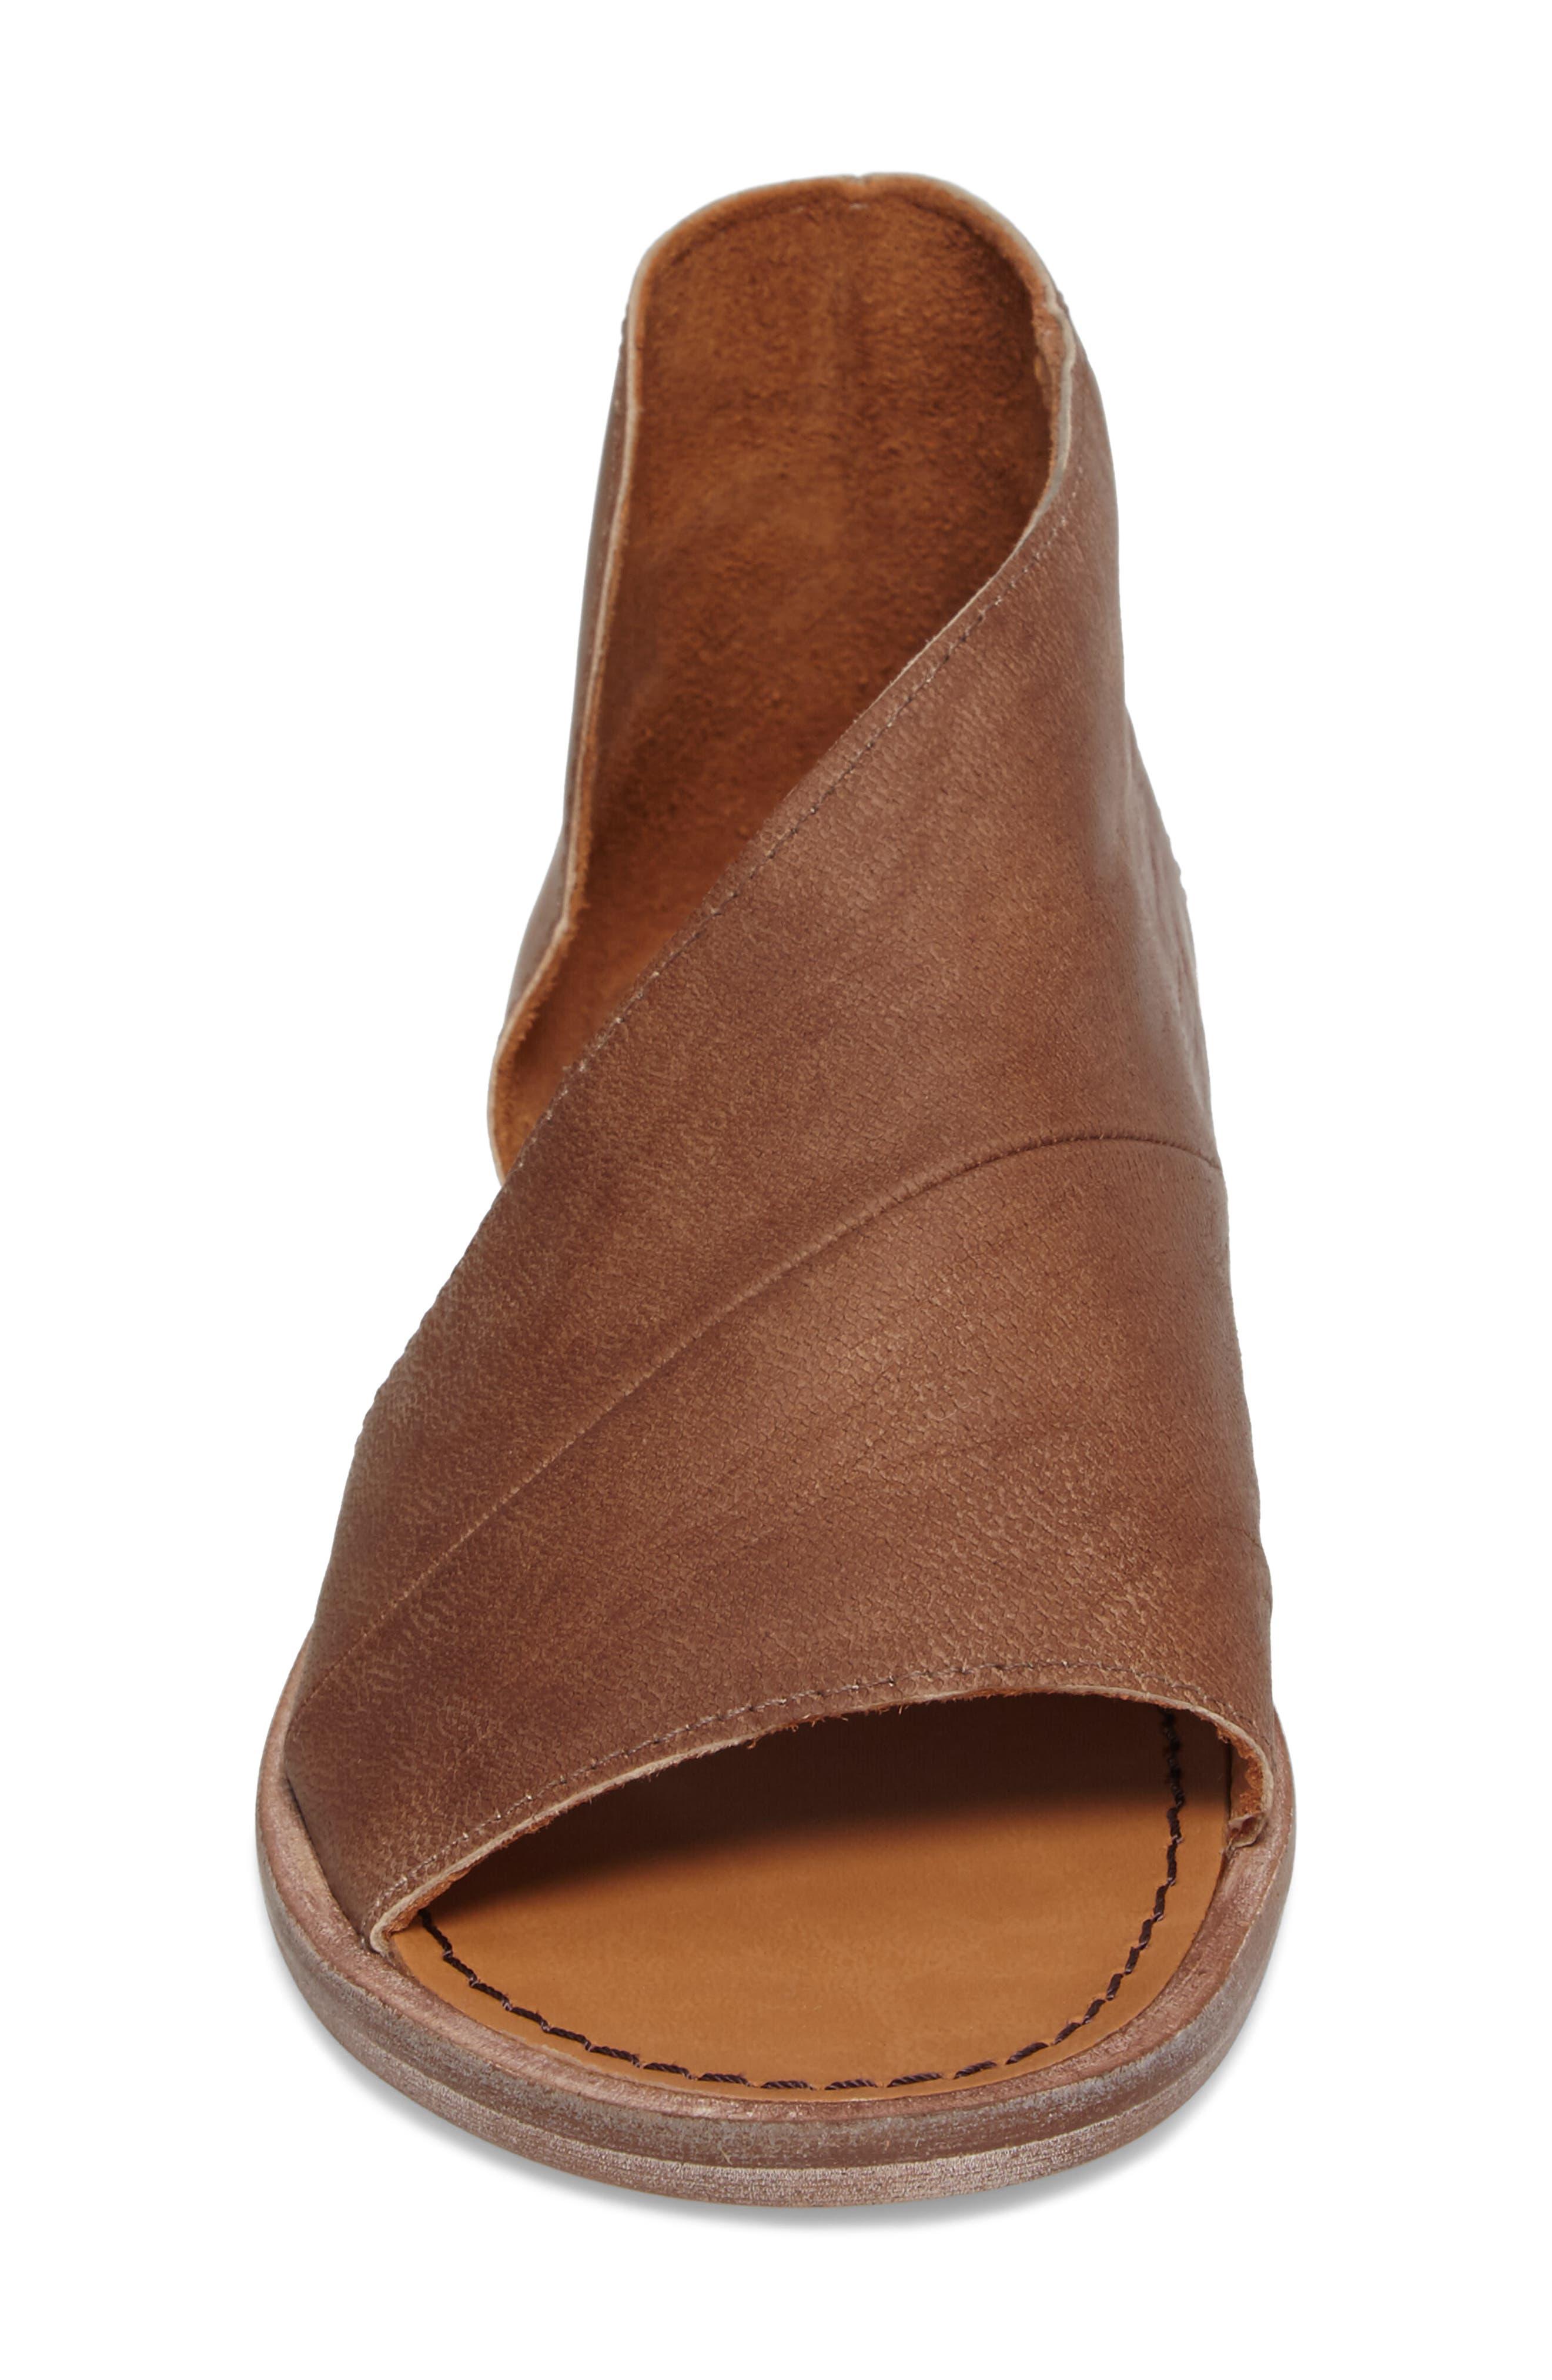 'Mont Blanc' Asymmetrical Sandal,                             Alternate thumbnail 51, color,